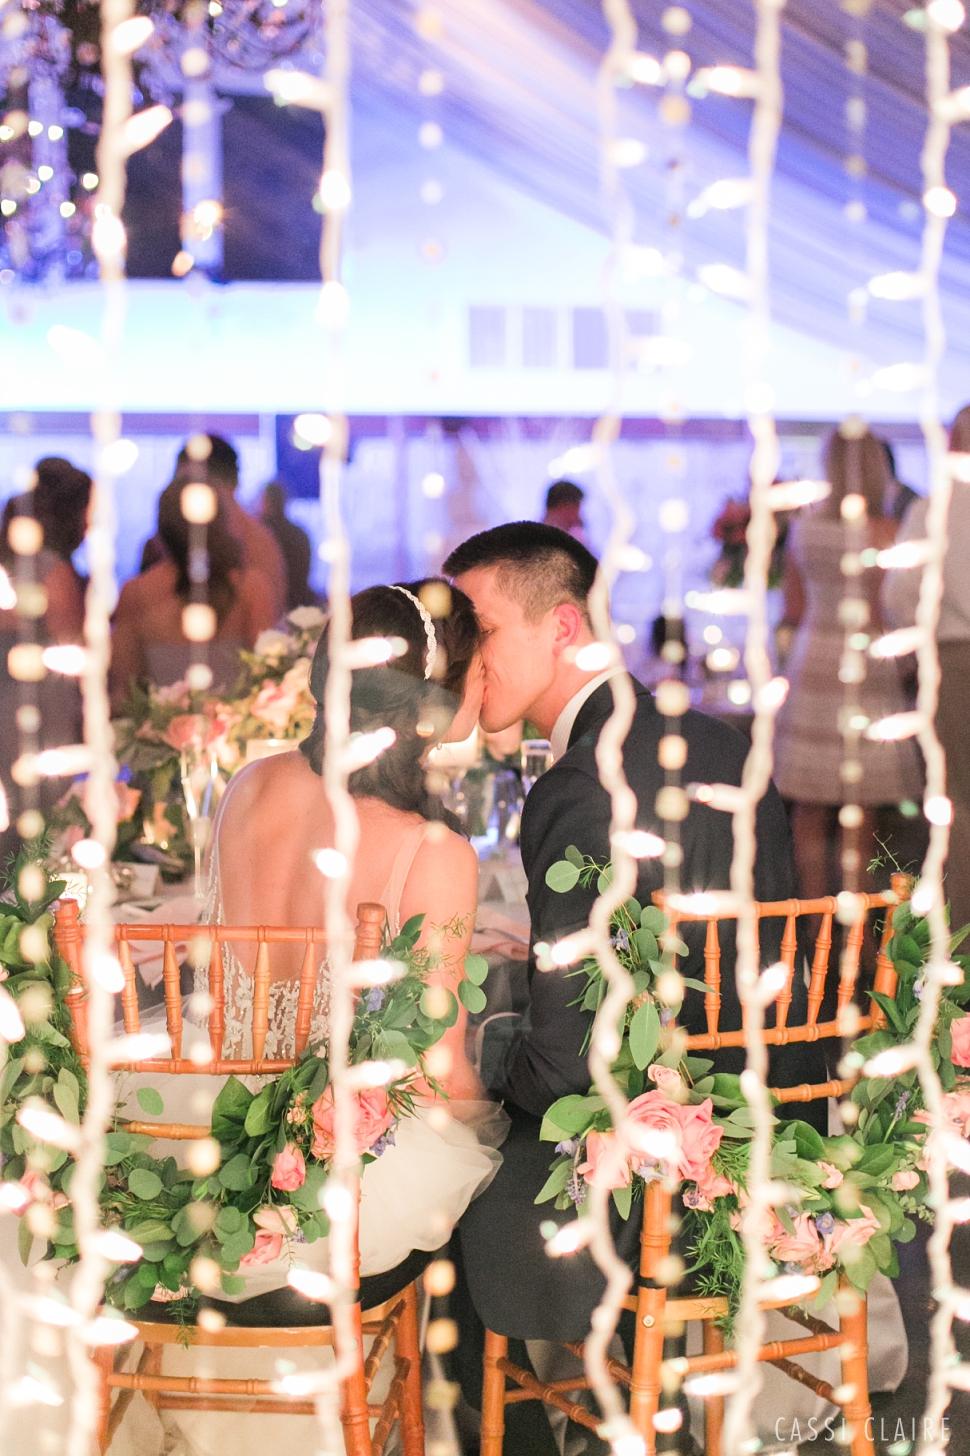 Lake-House-Inn-PA-Wedding_Cassi-Claire_42.jpg